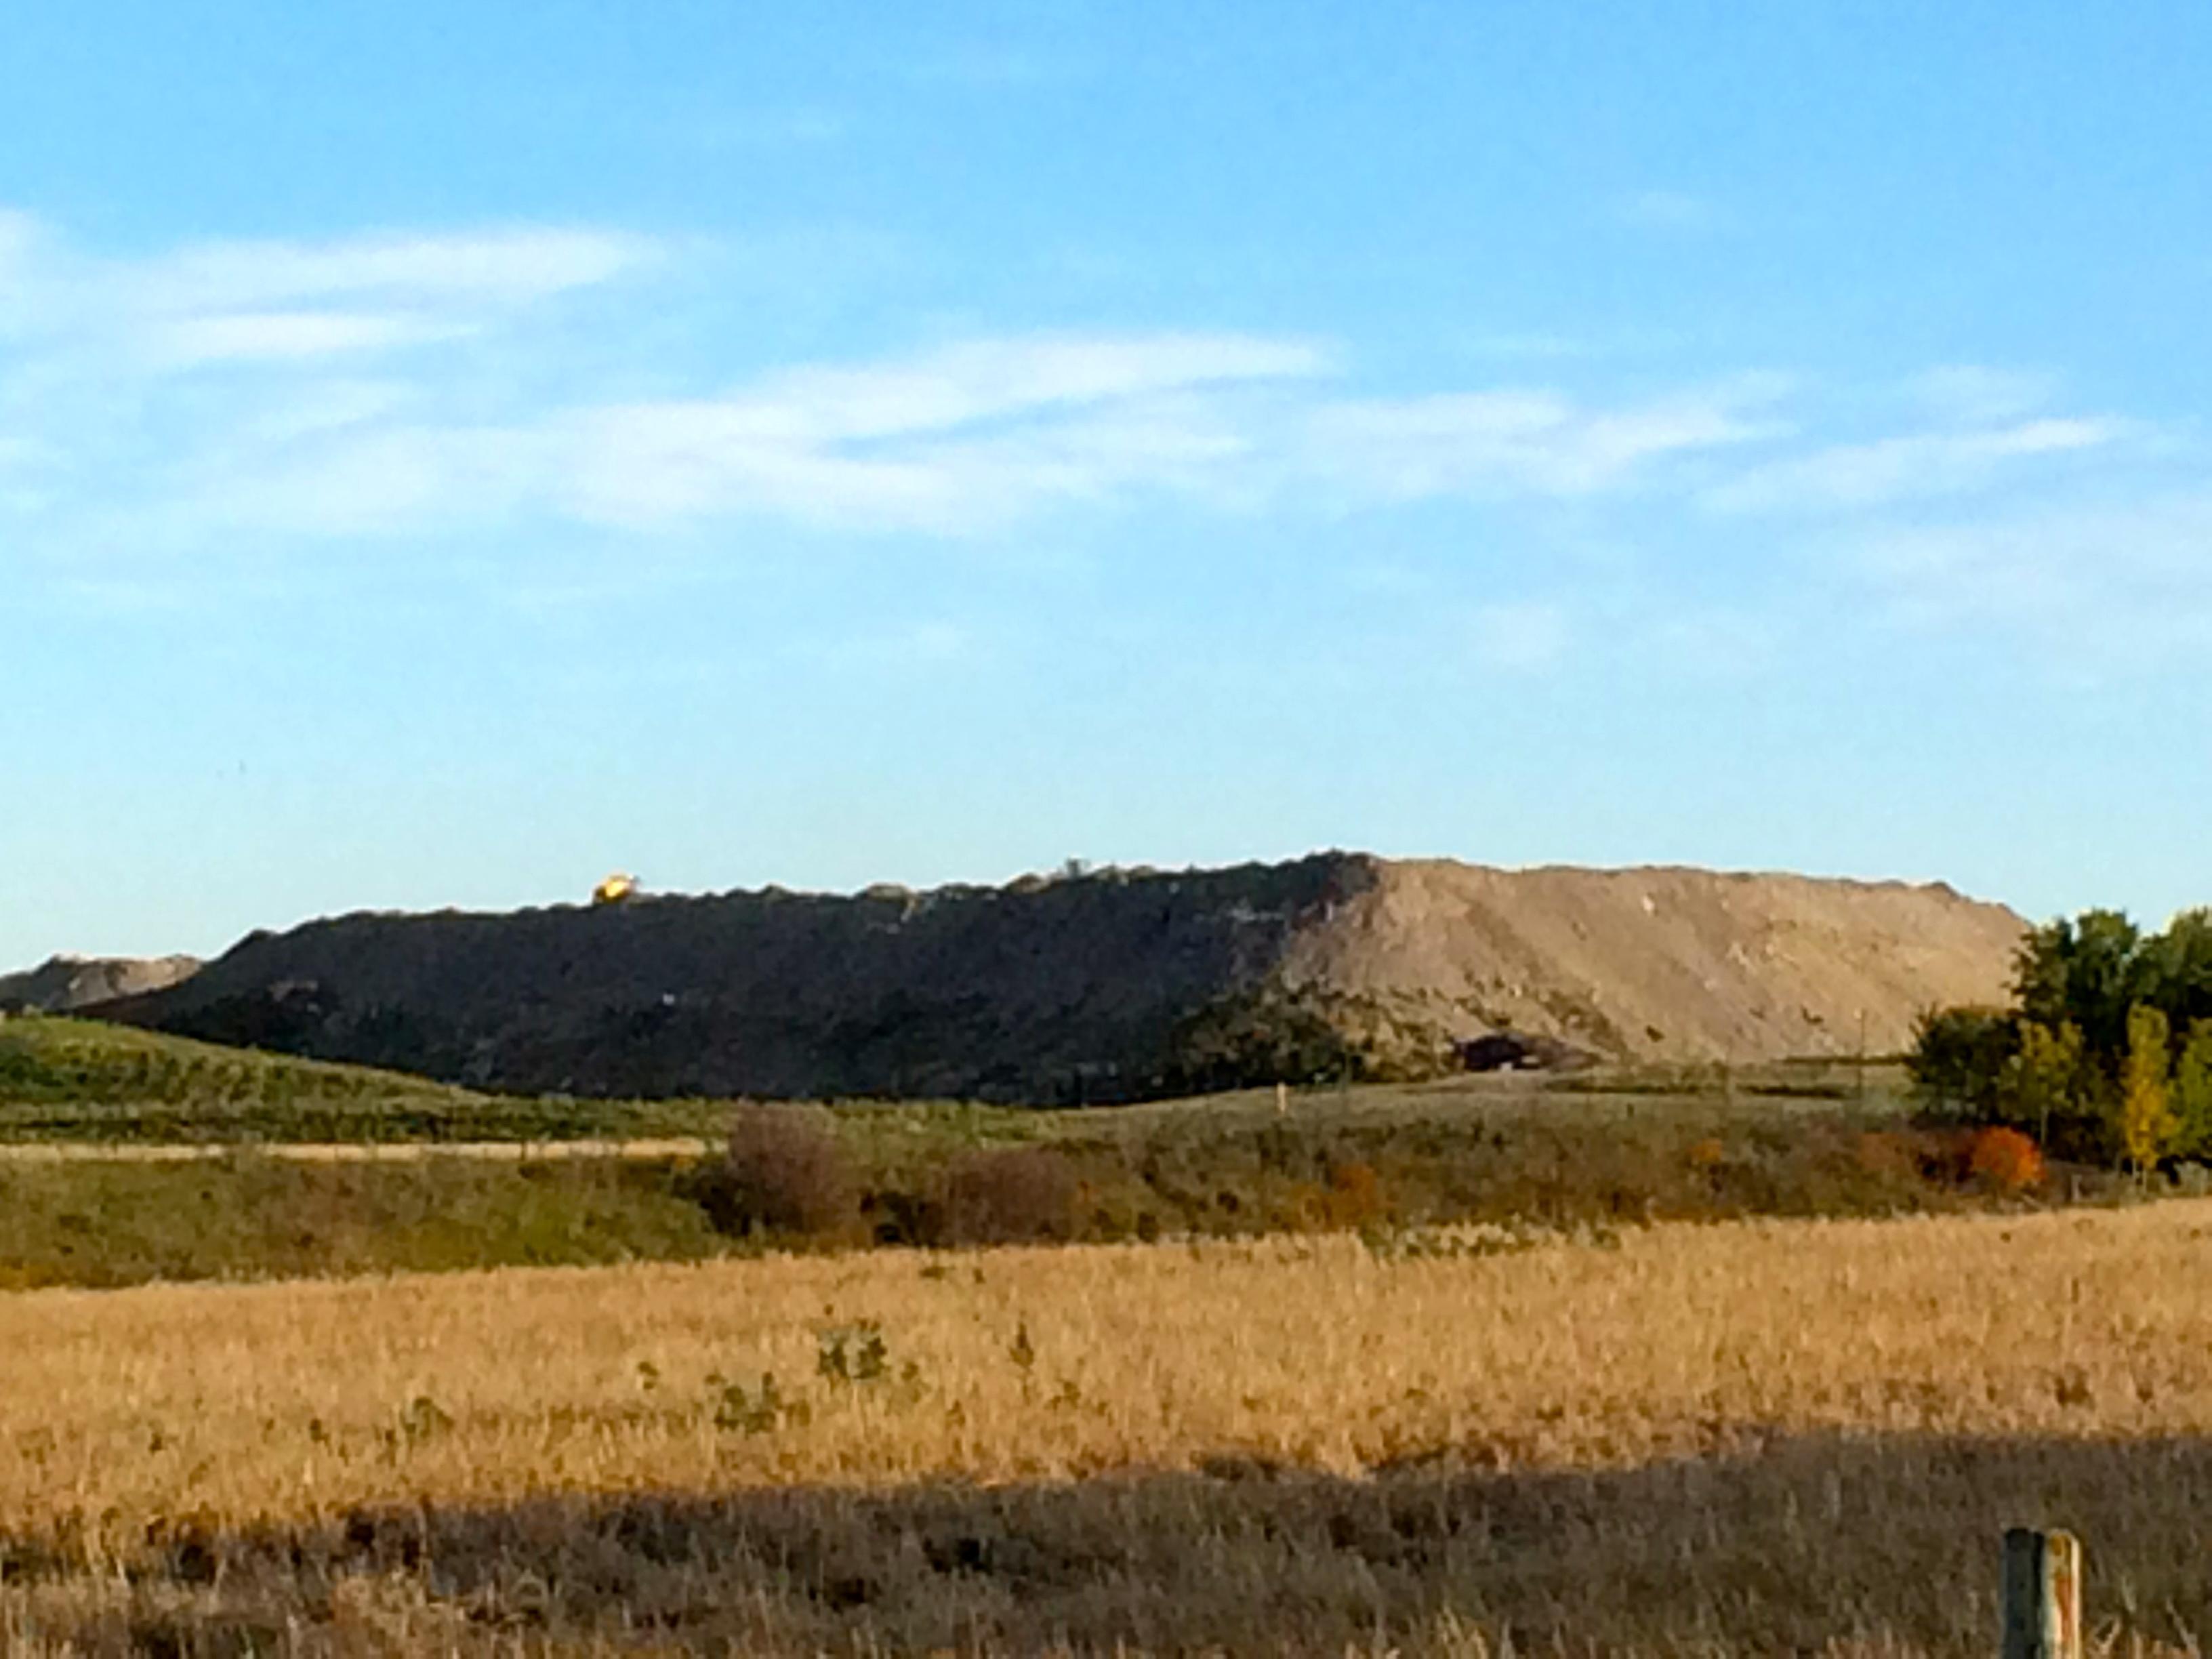 2016-09-27-toxic-oilfield-waste-pile-at-didsbury-landfill-alberta